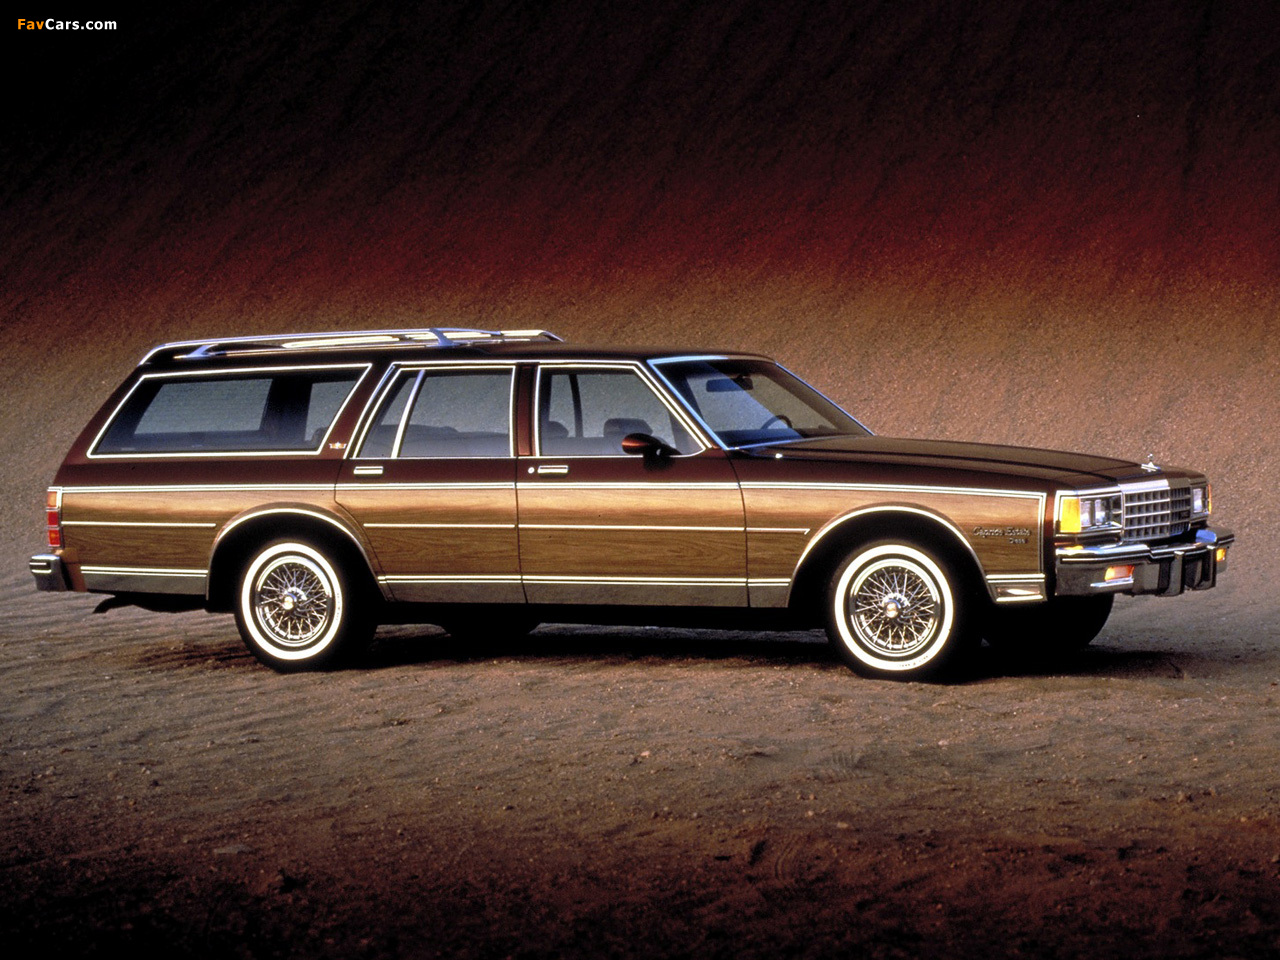 Chevrolet Caprice Estate Wagon 1985 Pictures 1280x960